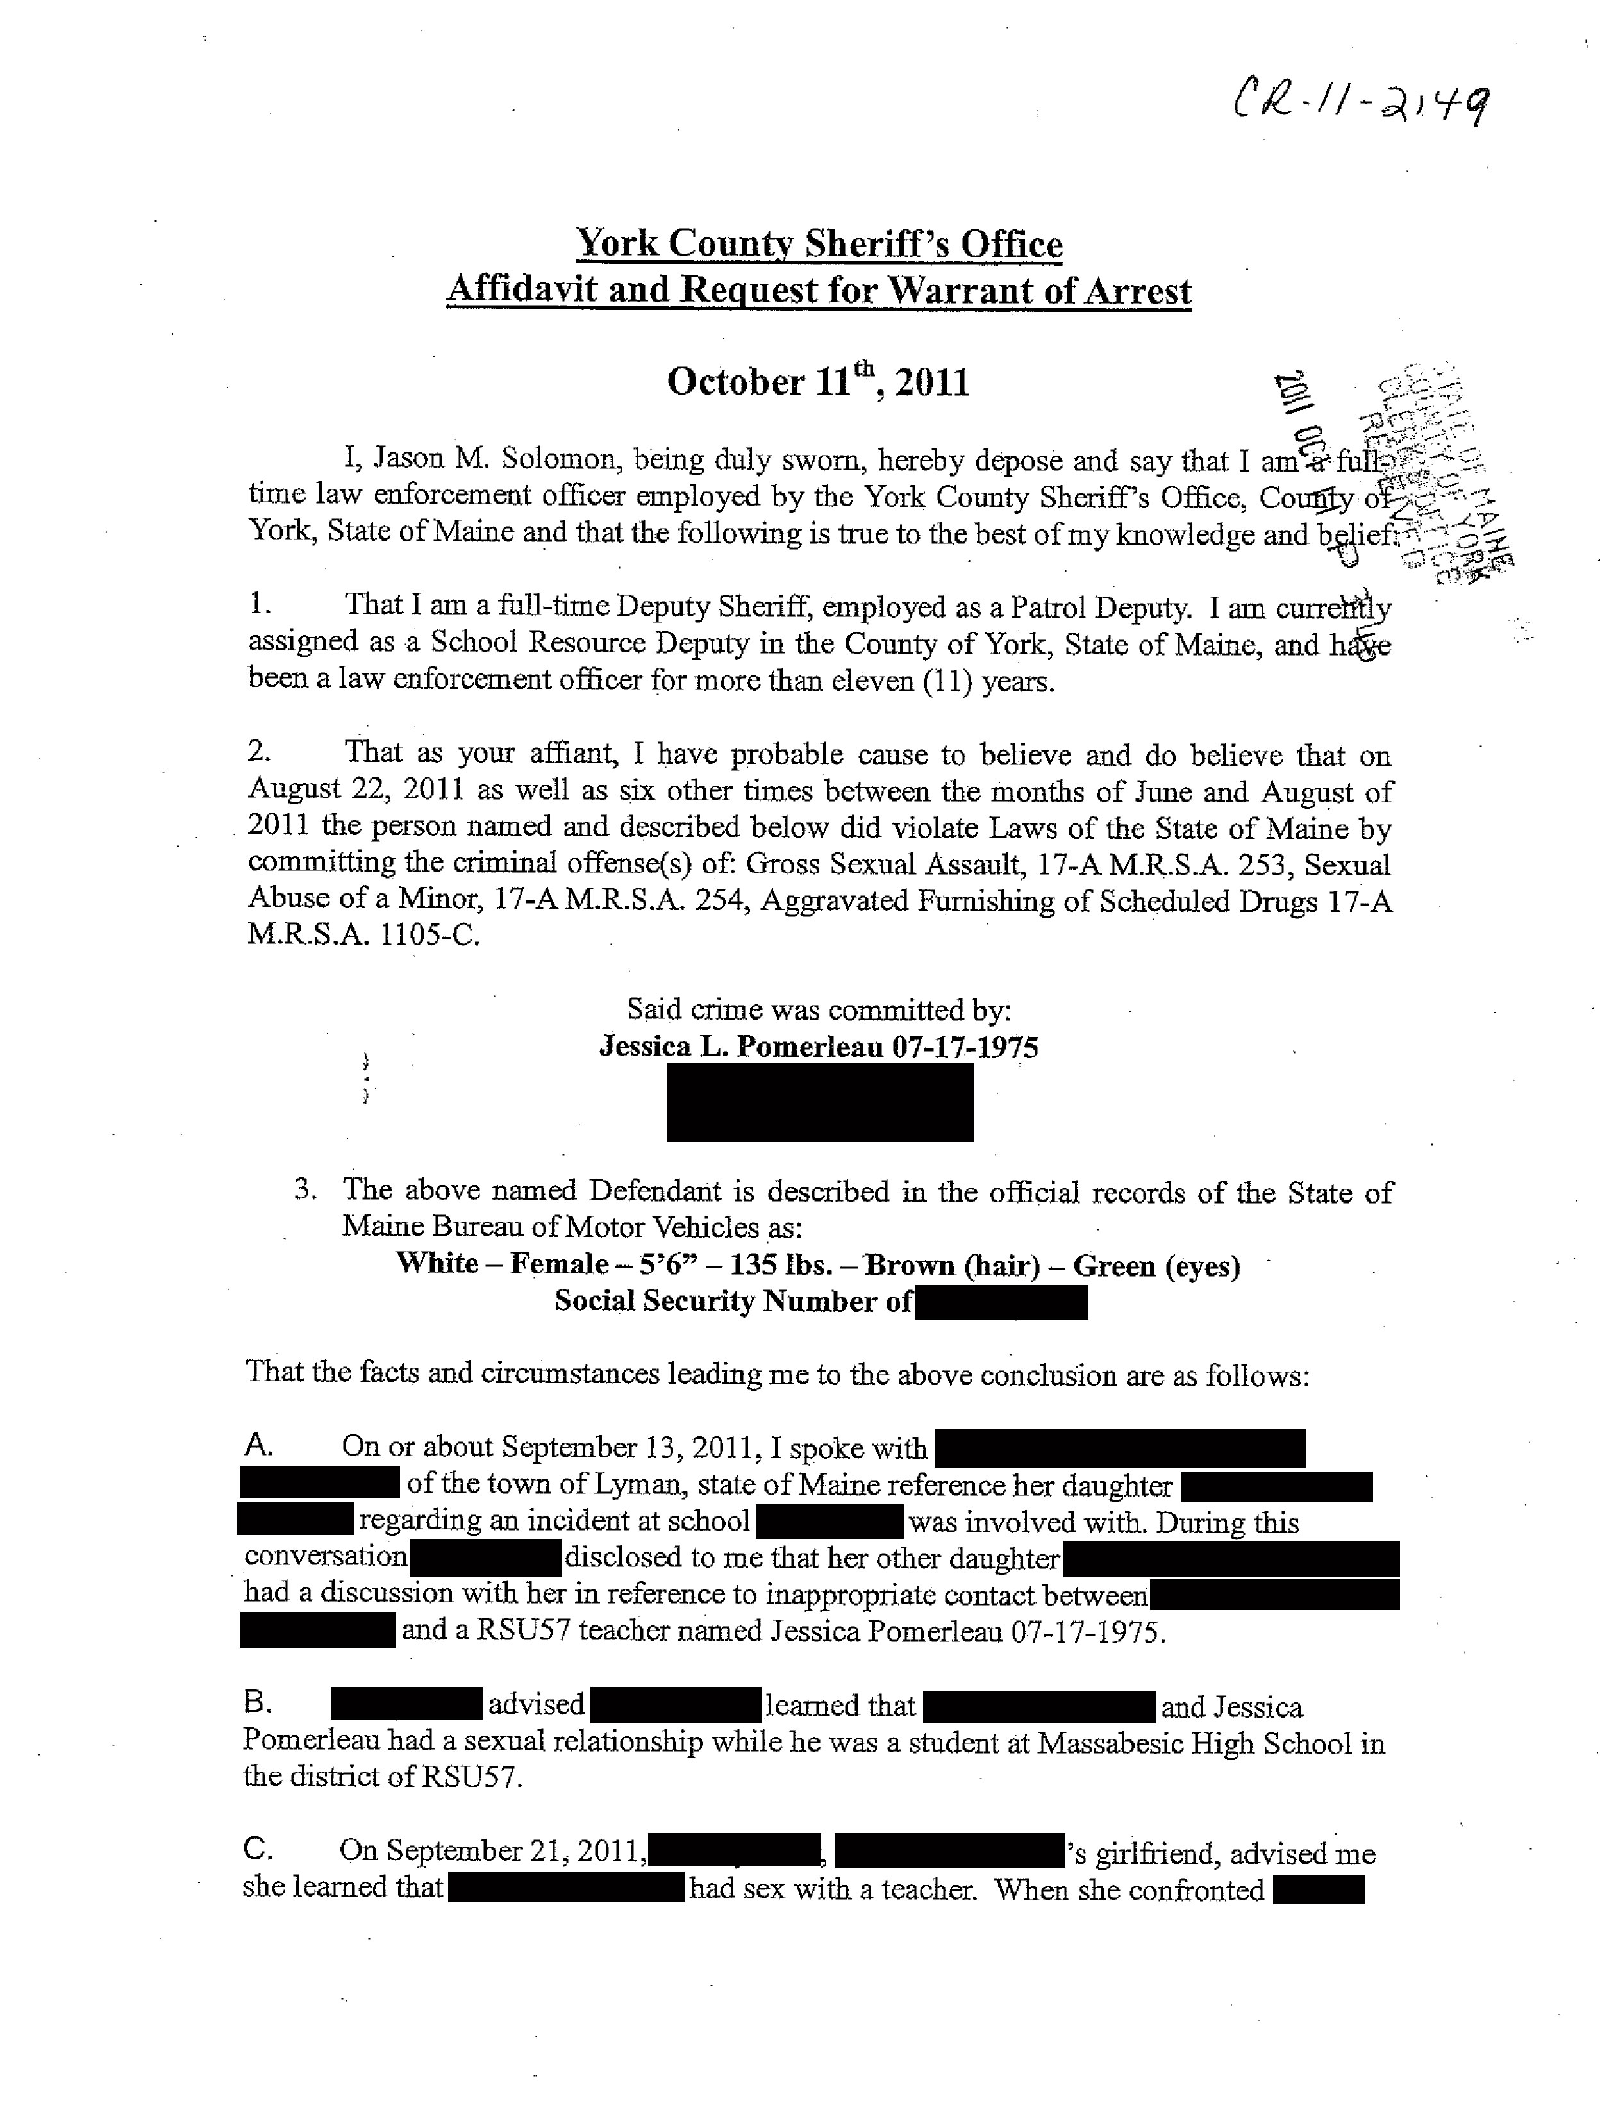 Copy of pomerleau jessica arrest affidavit1.png